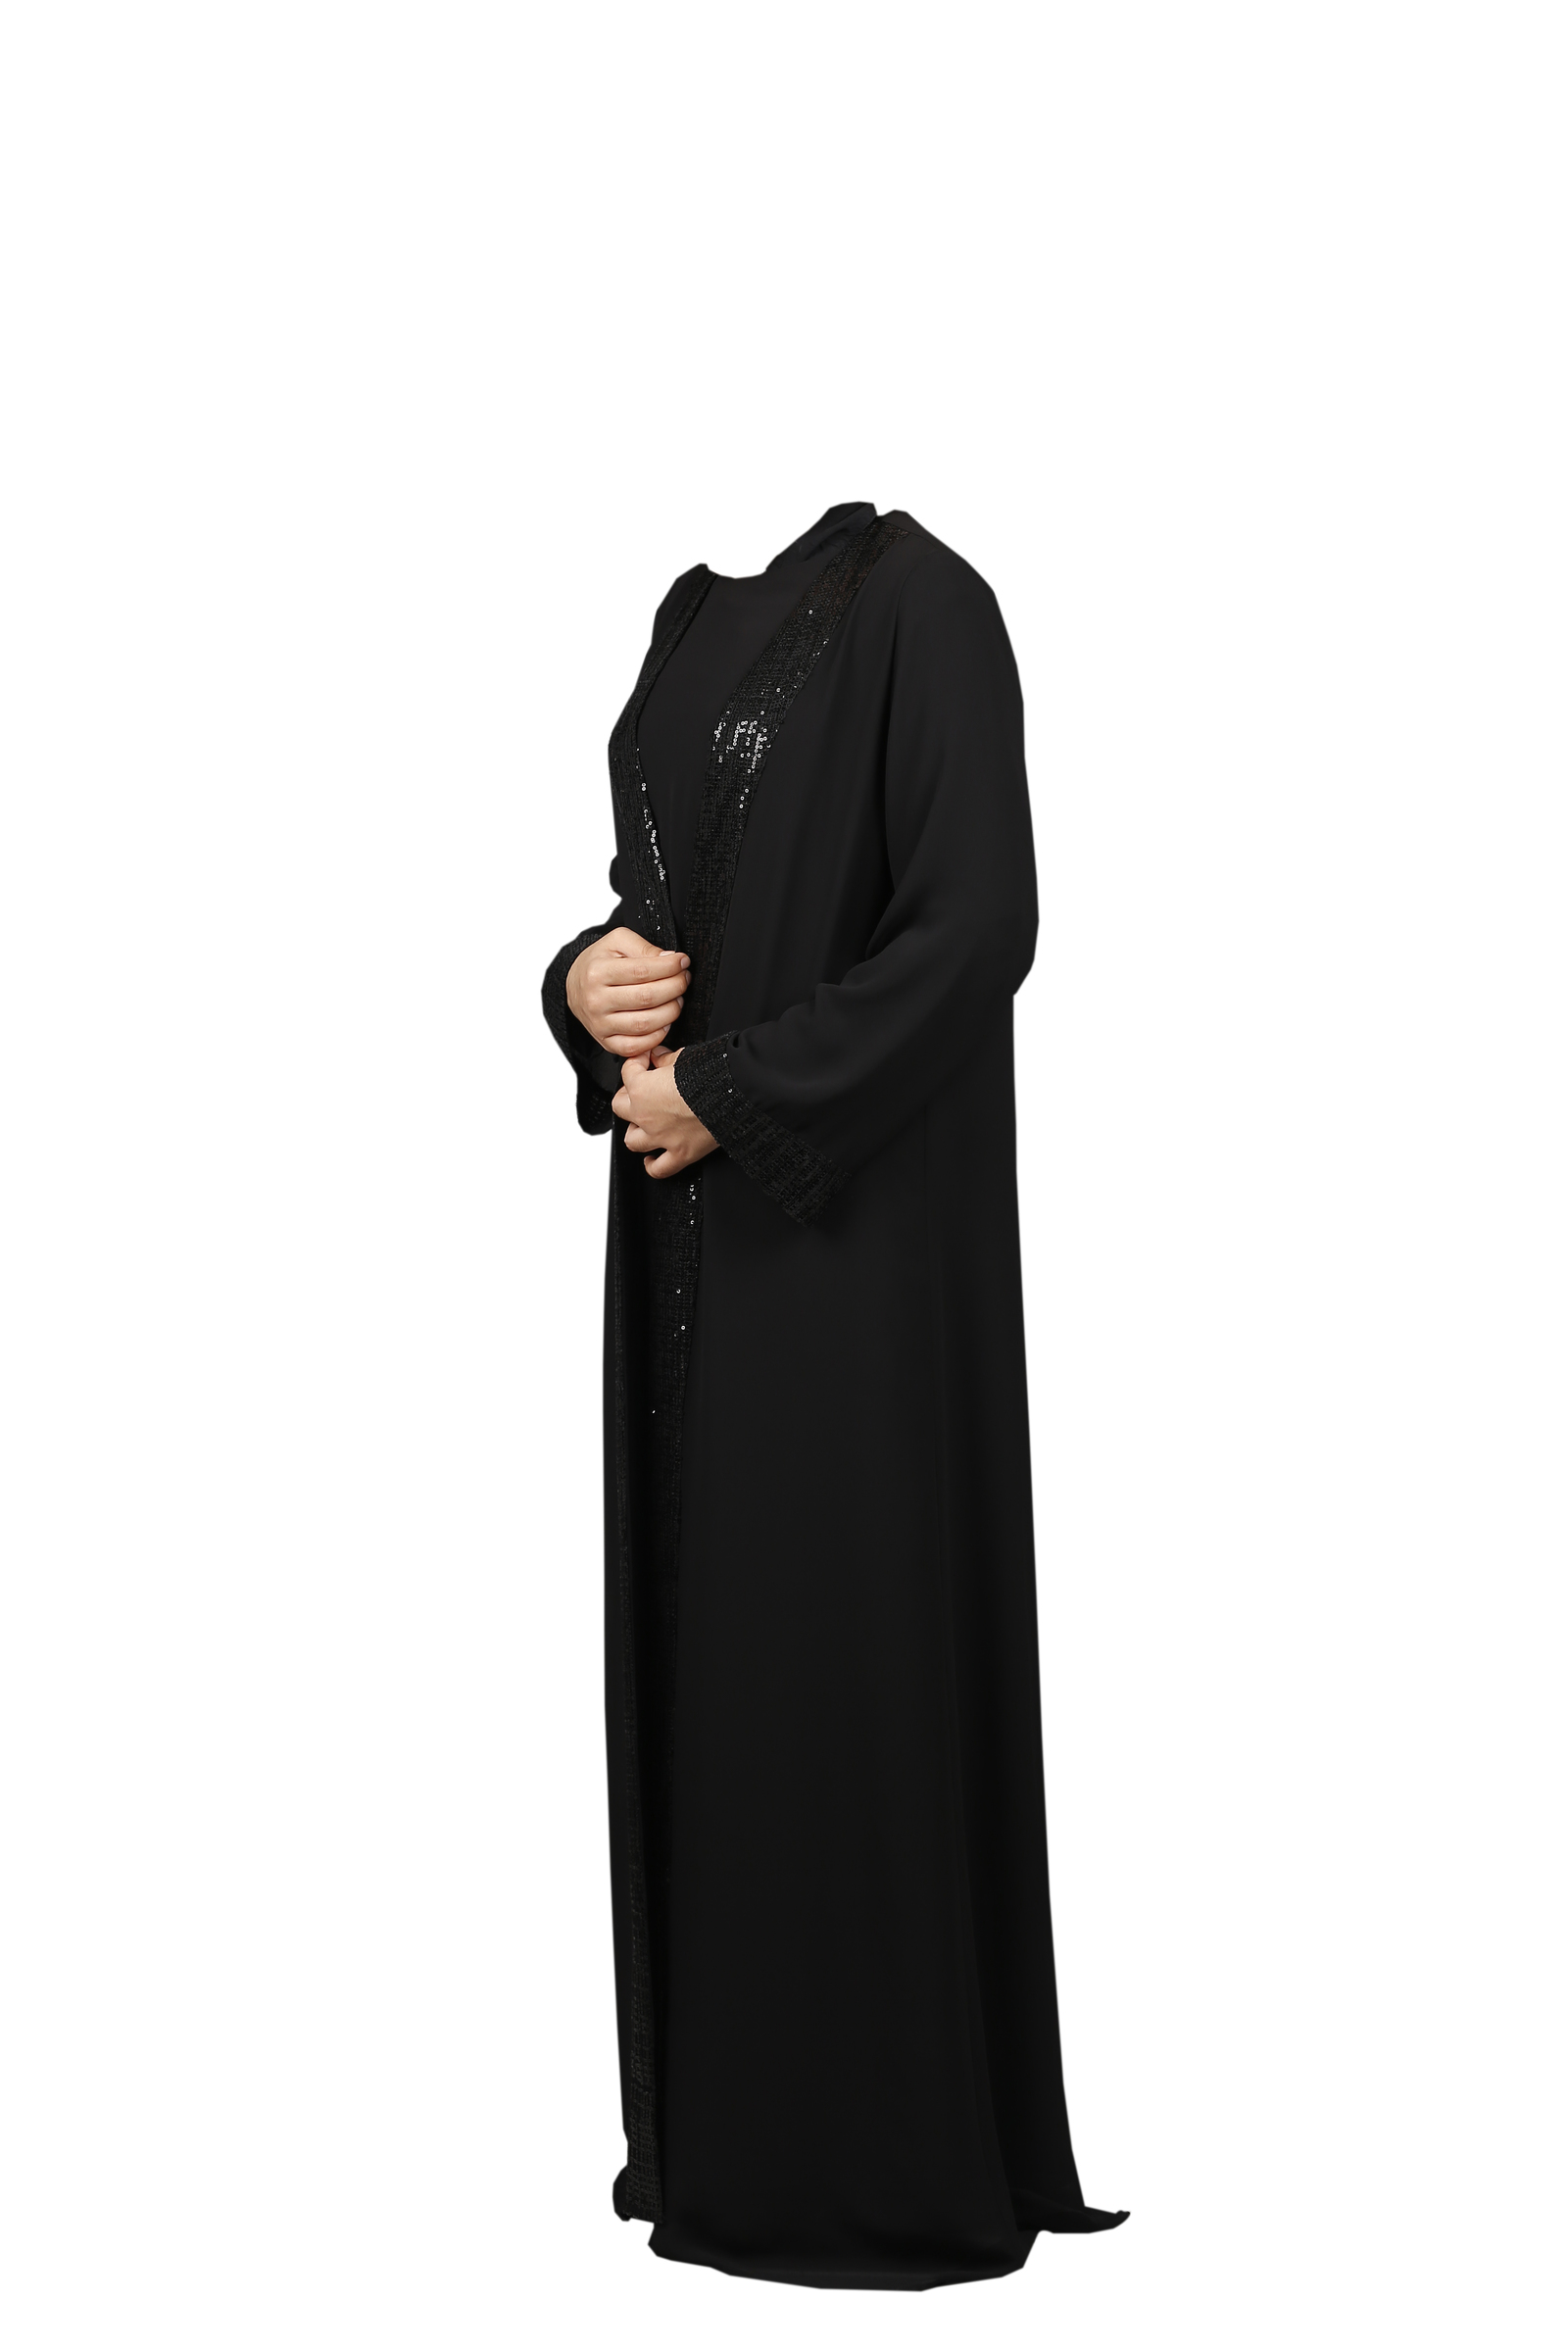 FSHTU011800045 Turkish Jubah - Black Embroider Zip With Cutslips C.jpg